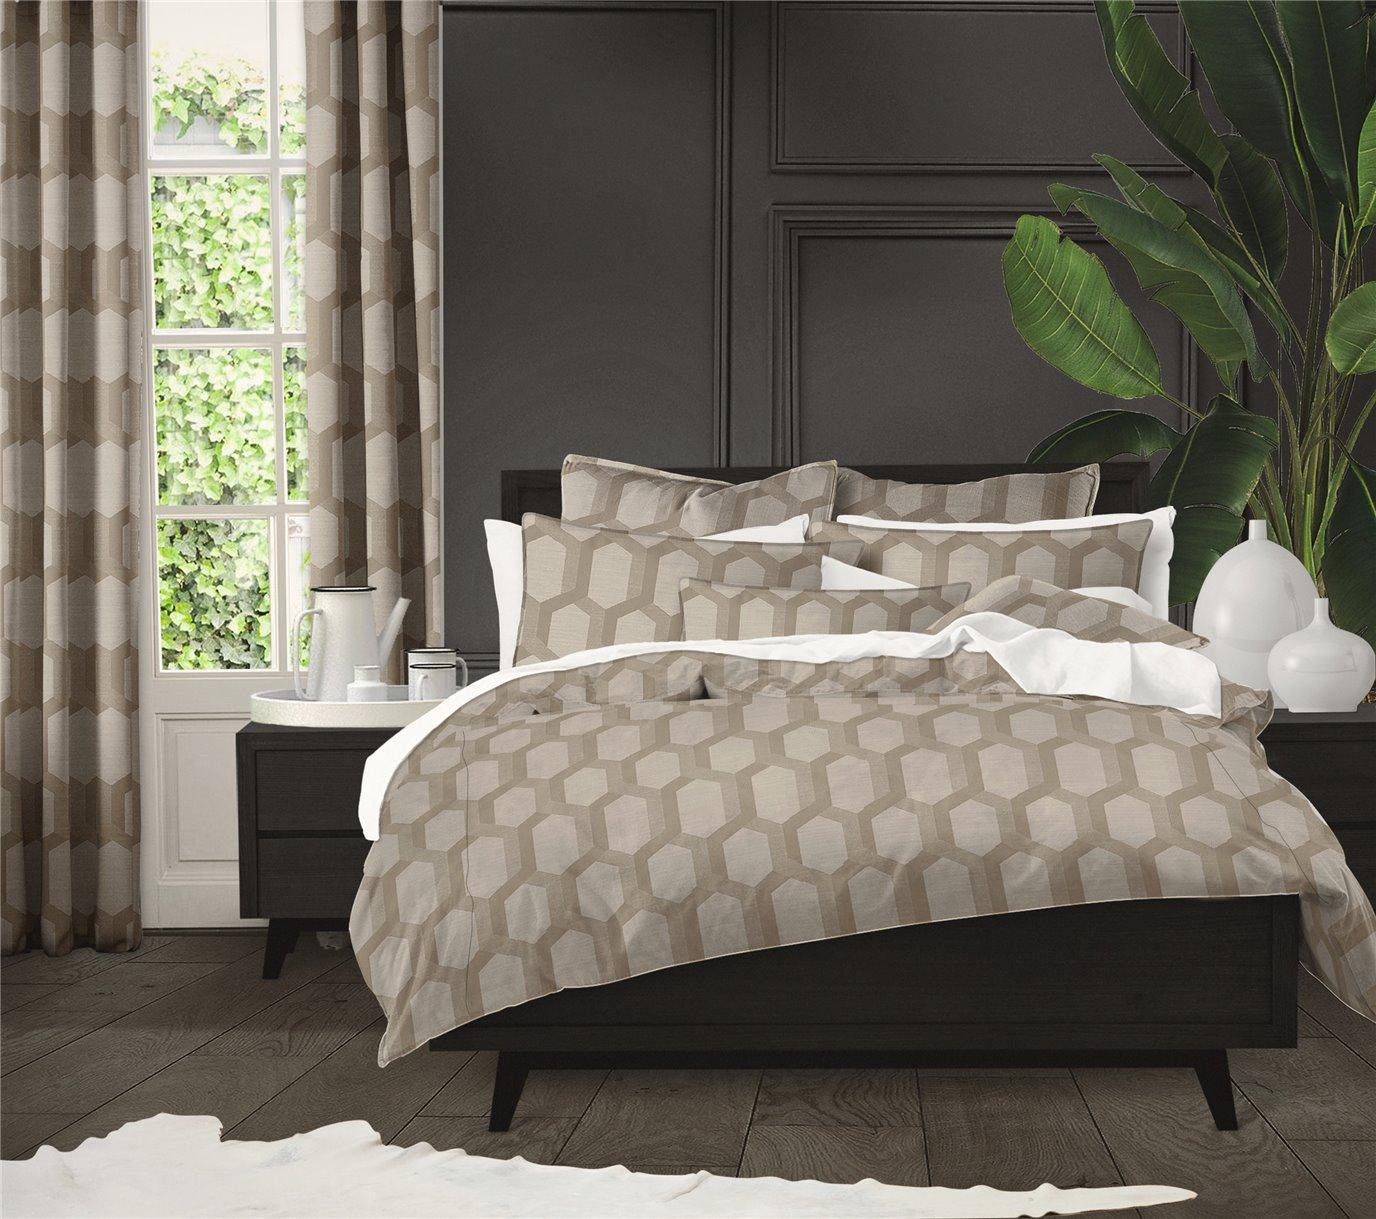 Maidstone Taupe Comforter Set - Queen